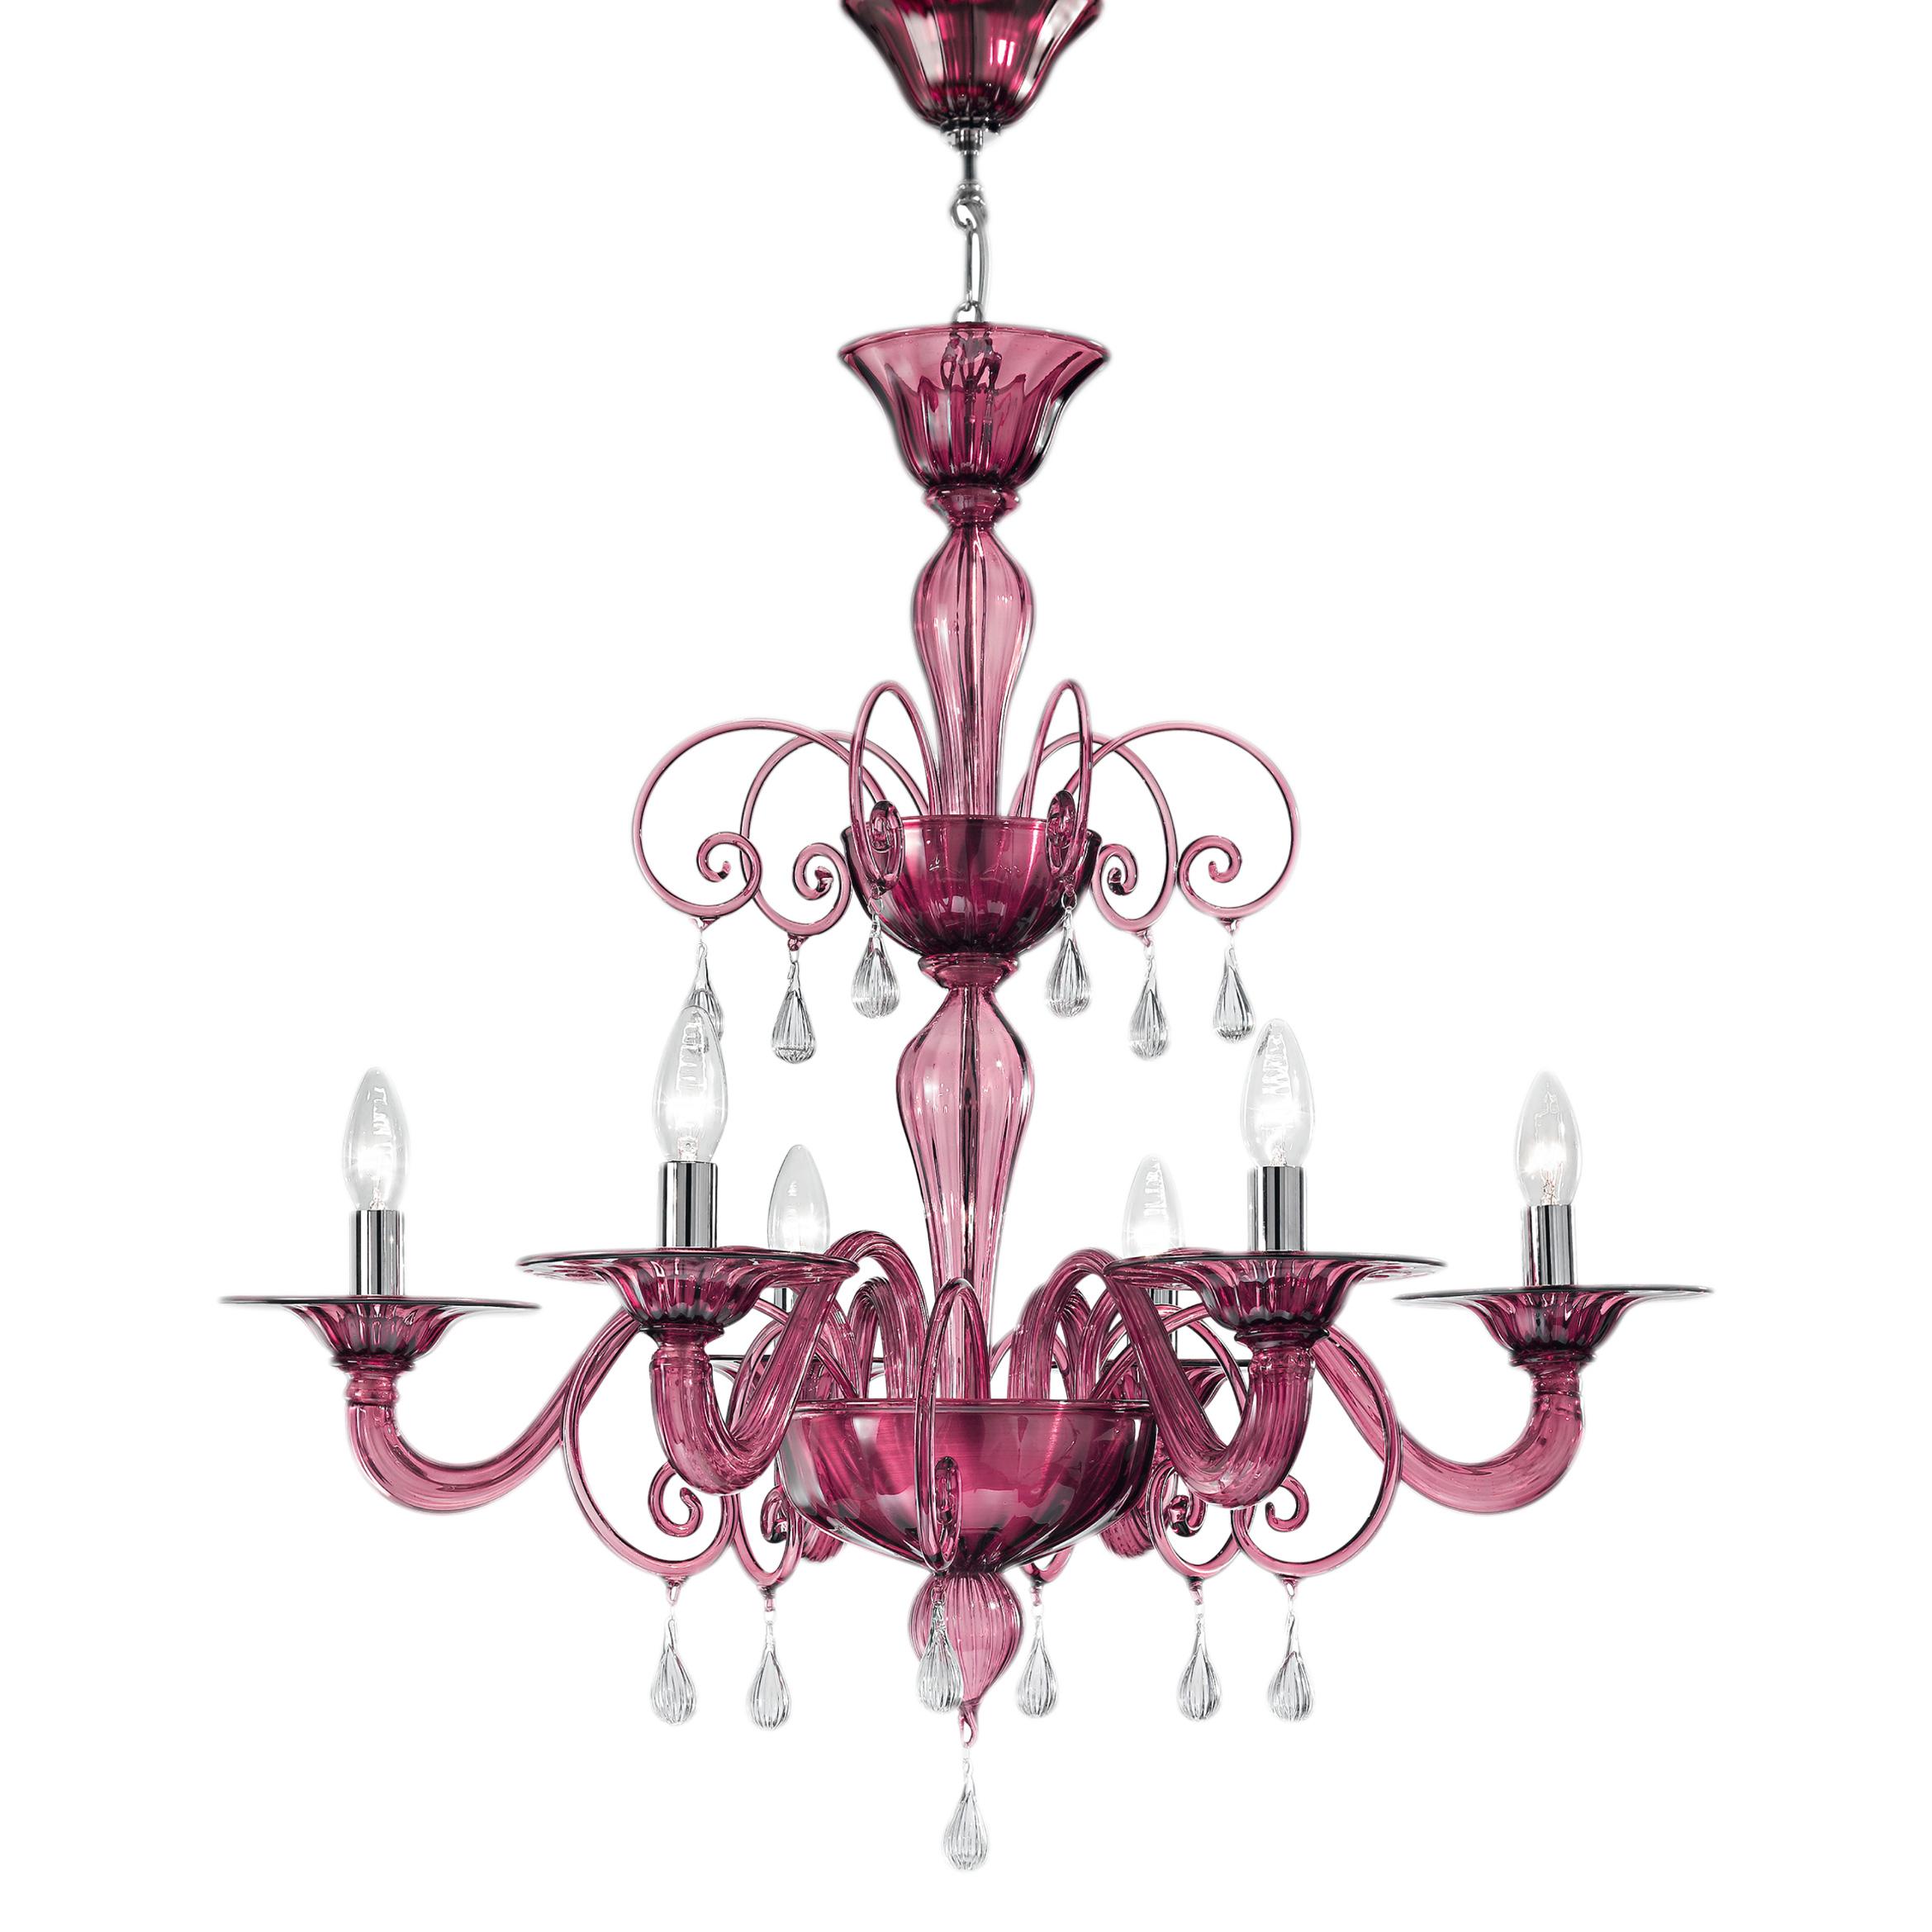 Jasmine villaverde london villaverde london jasmine amethyst murano chandelier square arubaitofo Gallery